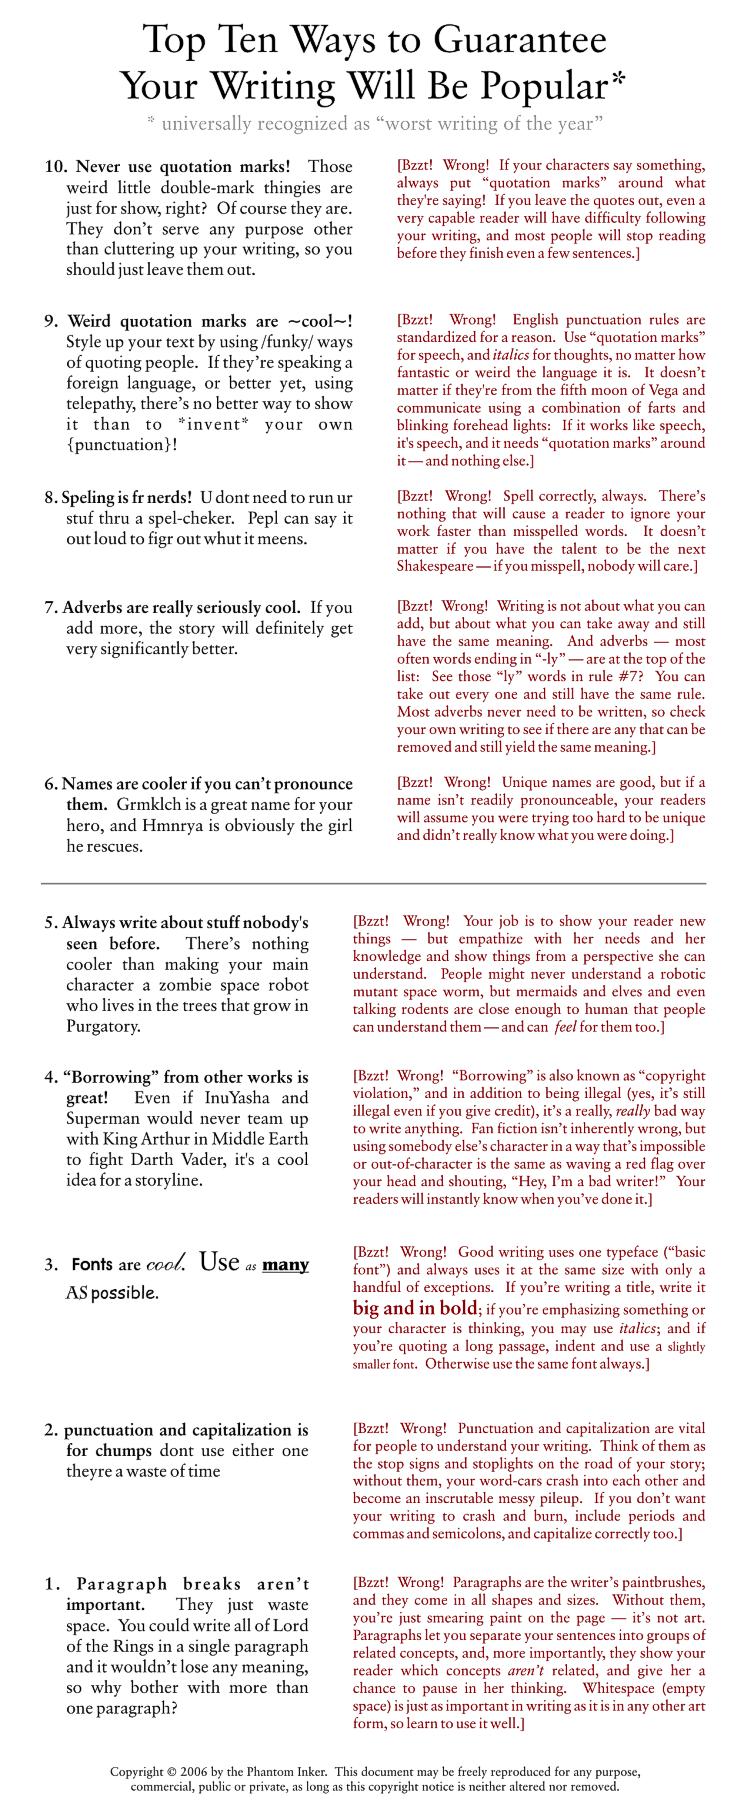 Guaranteed Popular Writing by phantom-inker